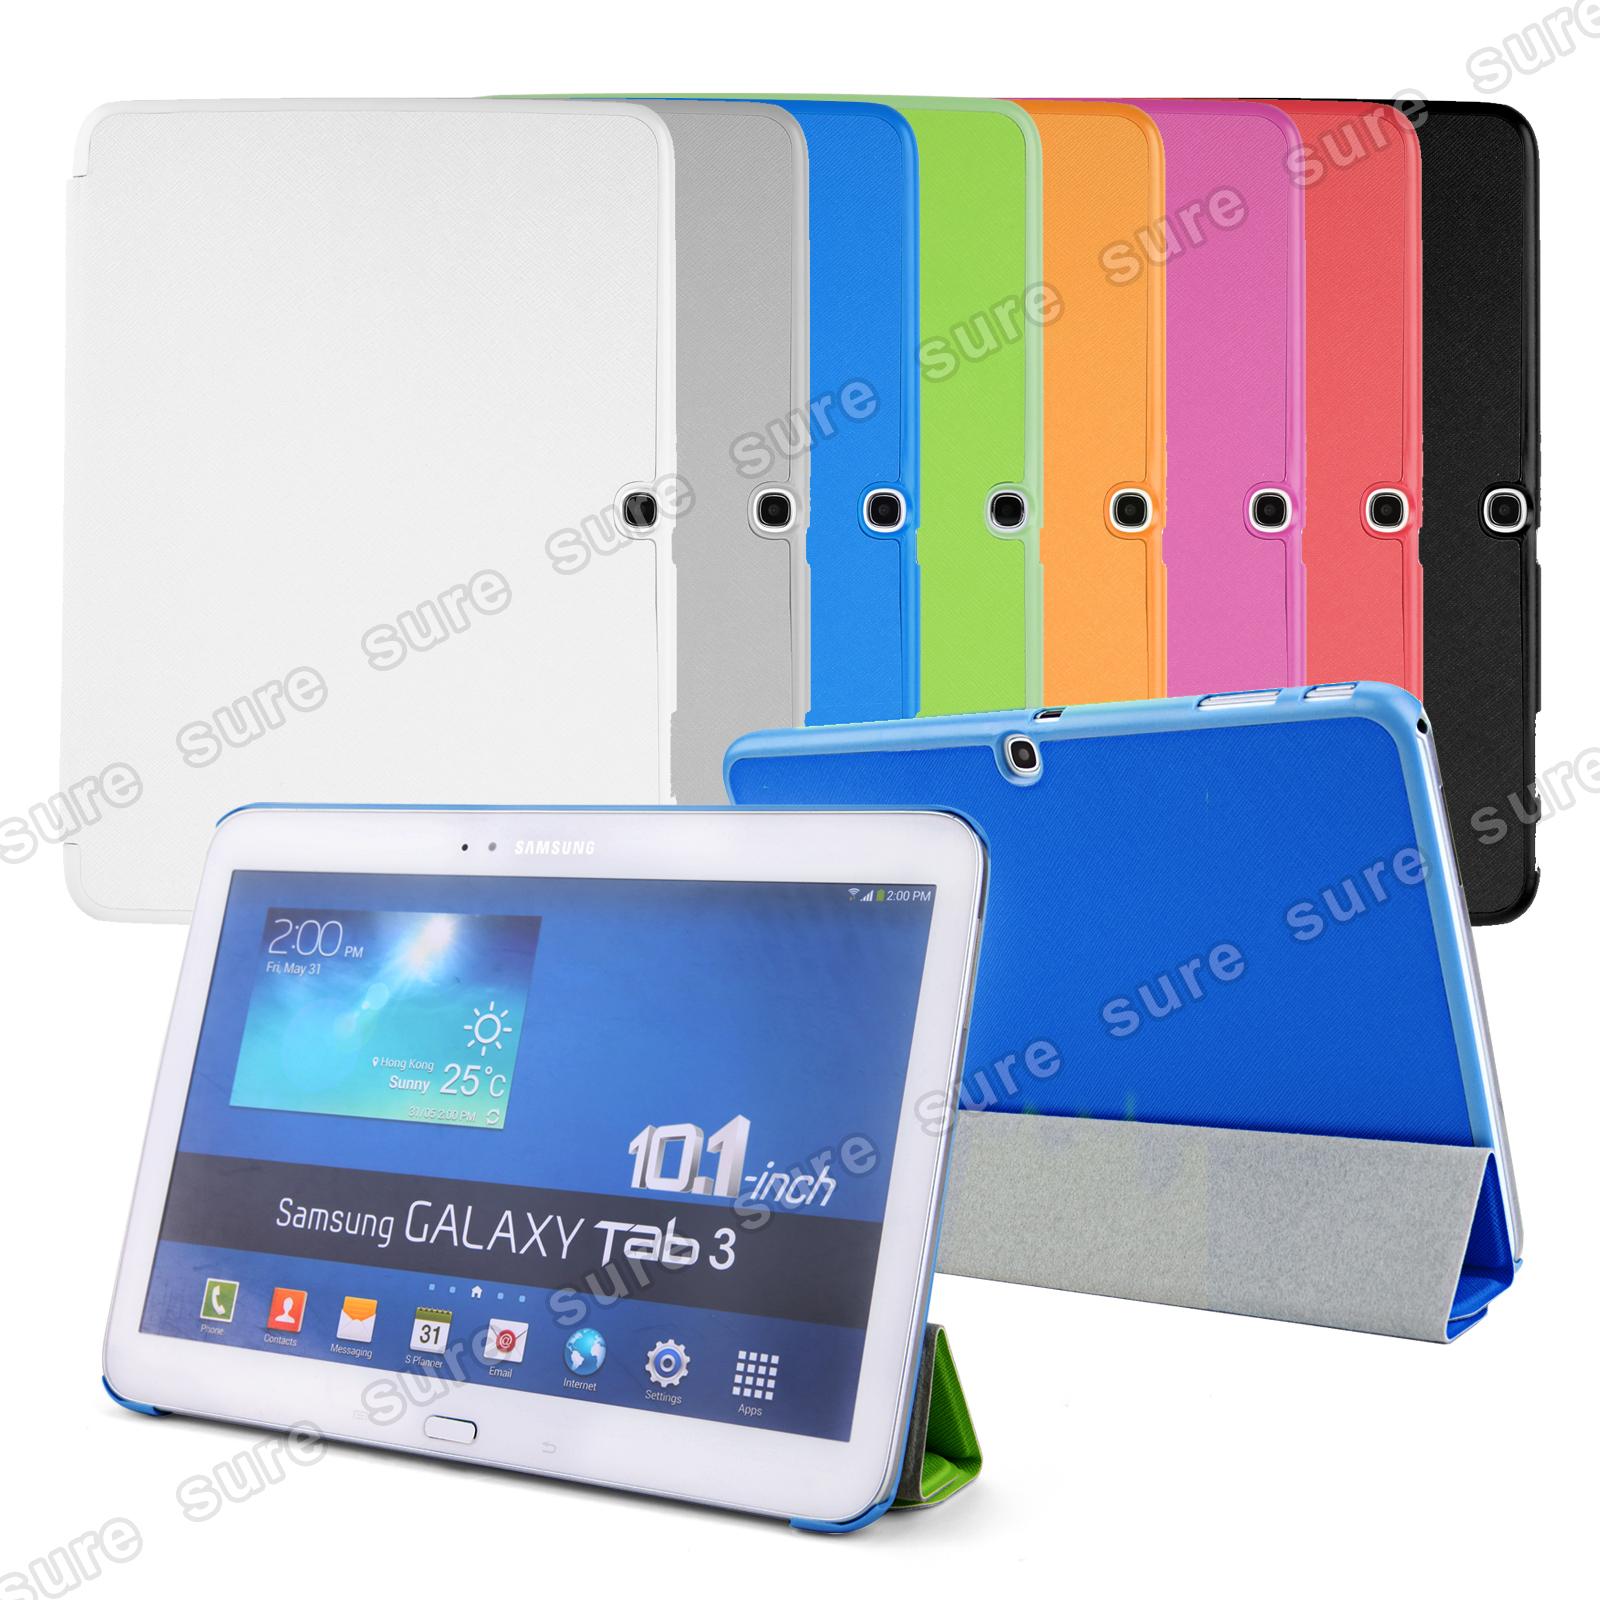 custodia tablet samsung tab a 10.1 originale